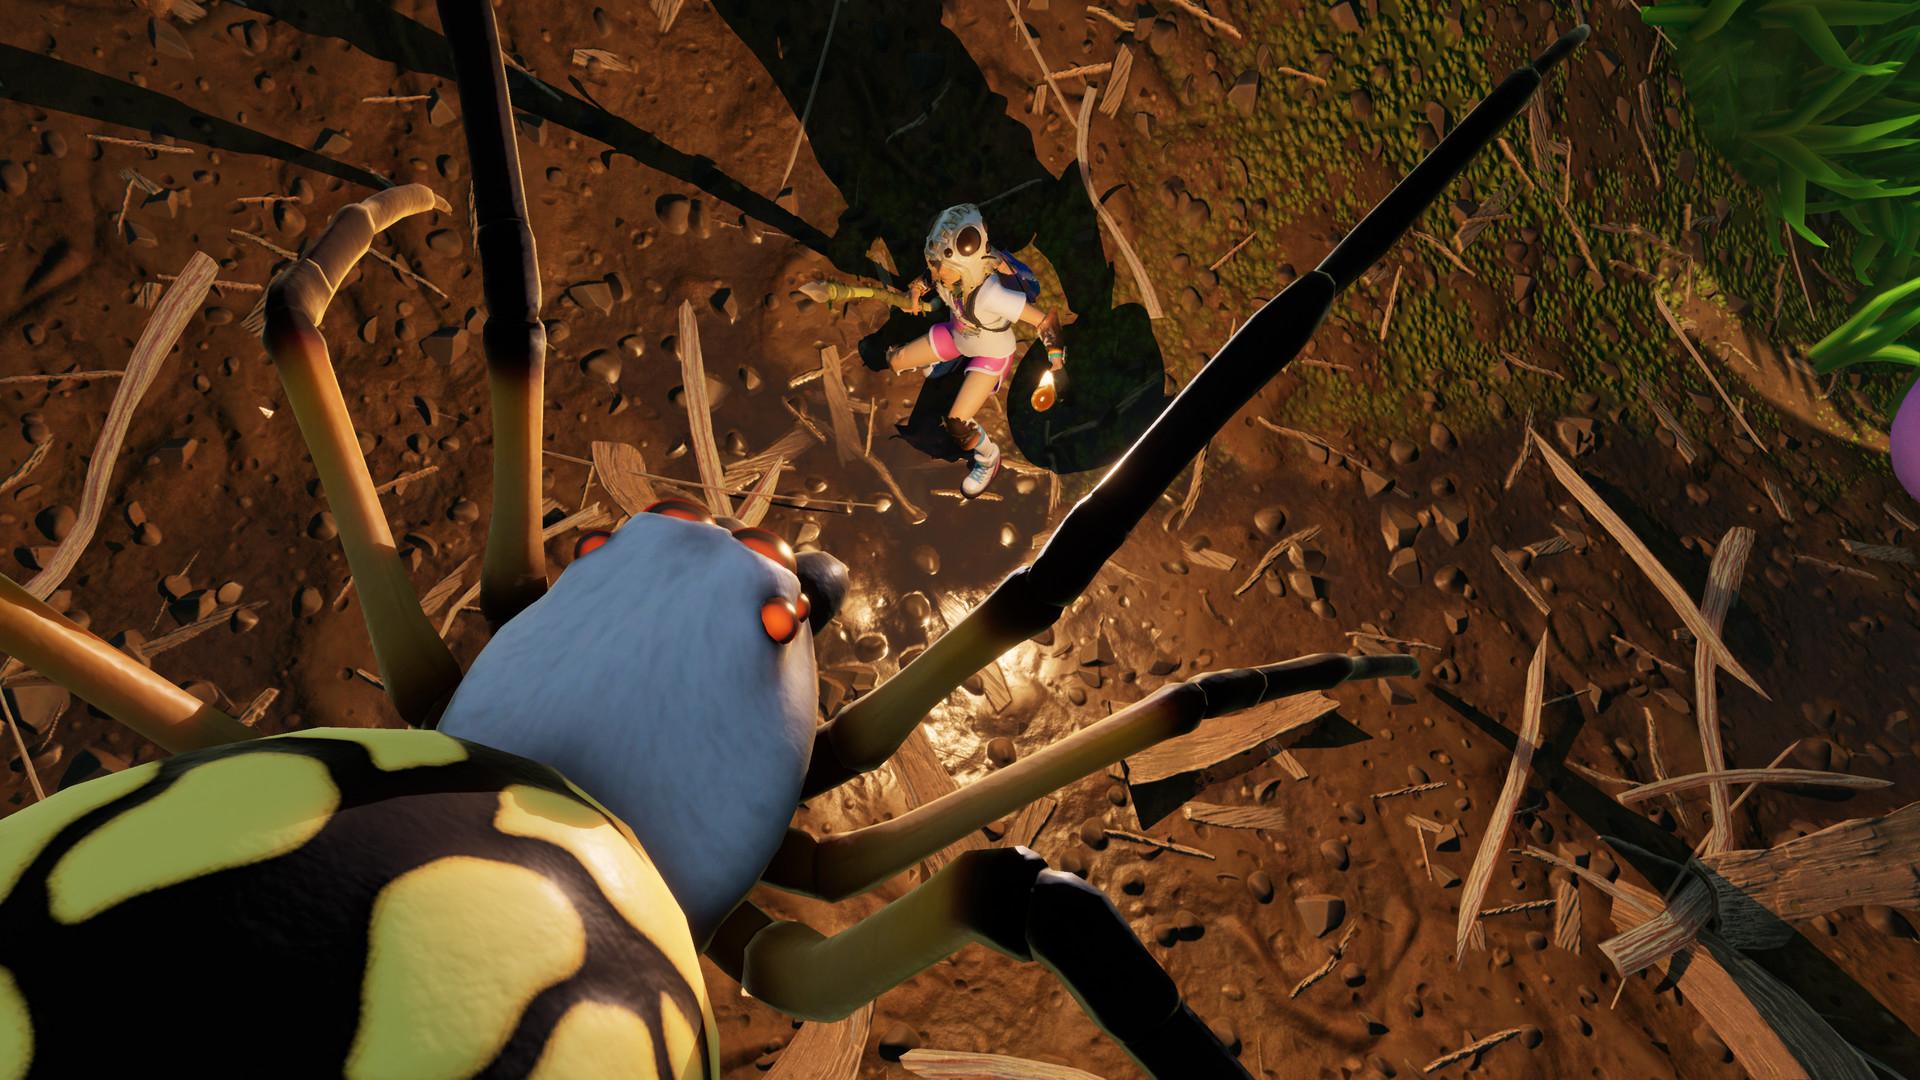 Obsidian в трейлере кооперативной выживалки Grounded прорекламировала Cyberpunk 2077